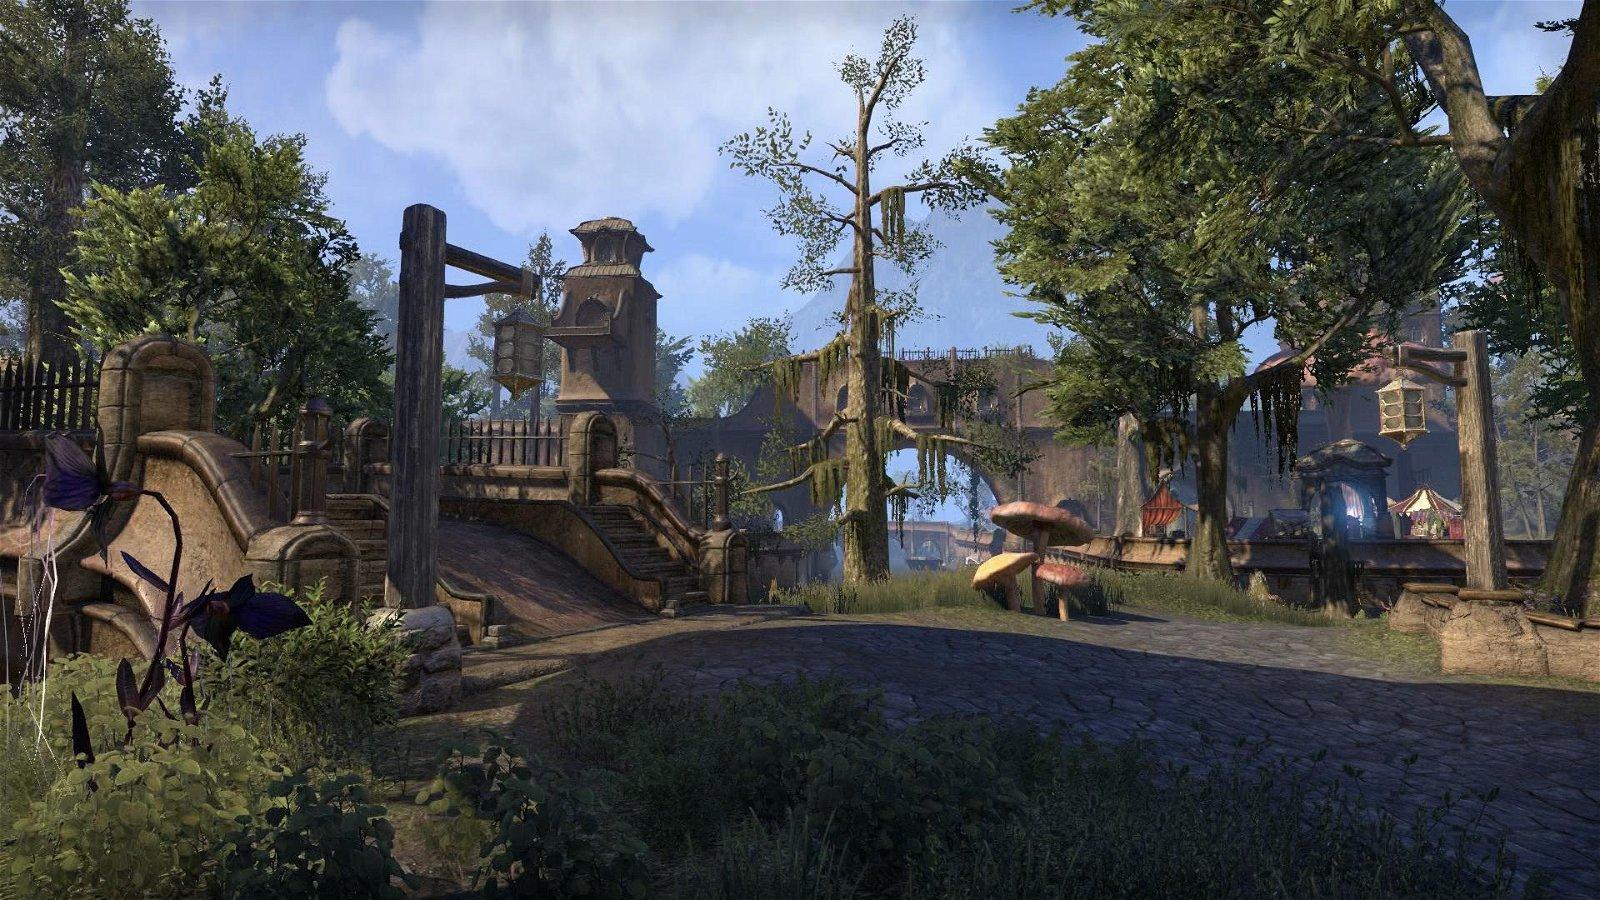 Elder Scrolls Online Morrowind Preview - Nostalgia Works Both Ways 1